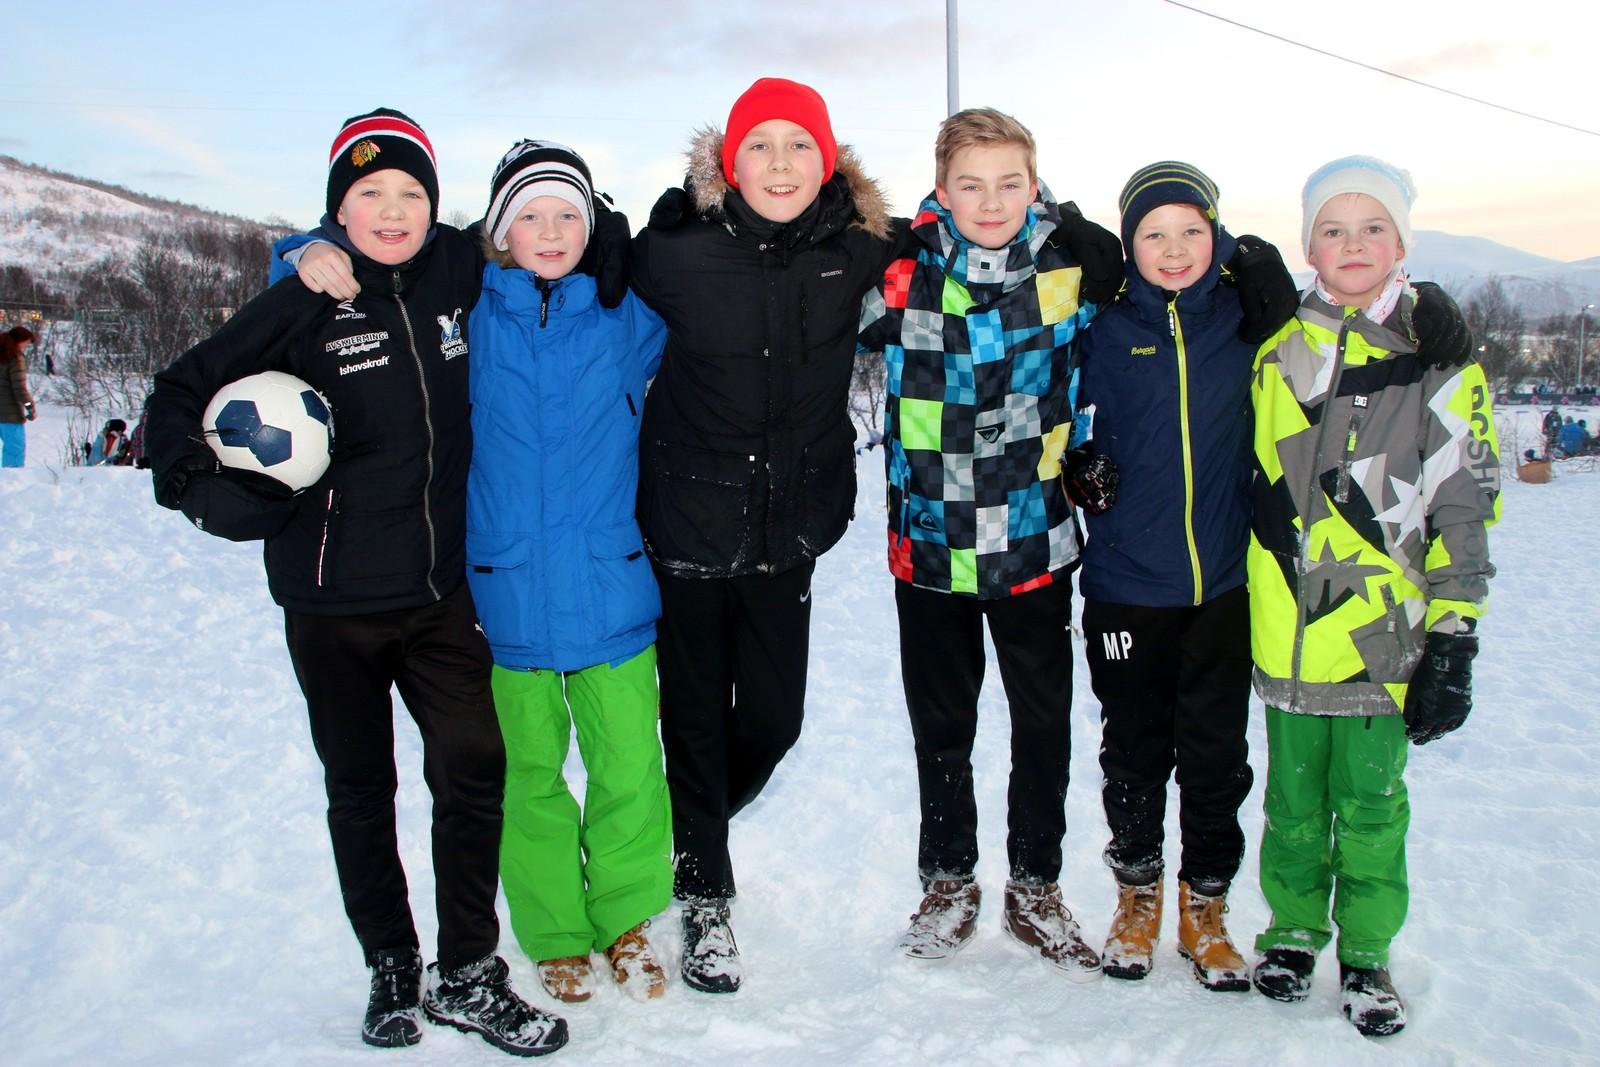 Isak Kastnes, Elias Walle Ramberg, Vebjørn Bakland, Elias Nordmo Johansen, Magnus Pedersen og Marius Sollid.